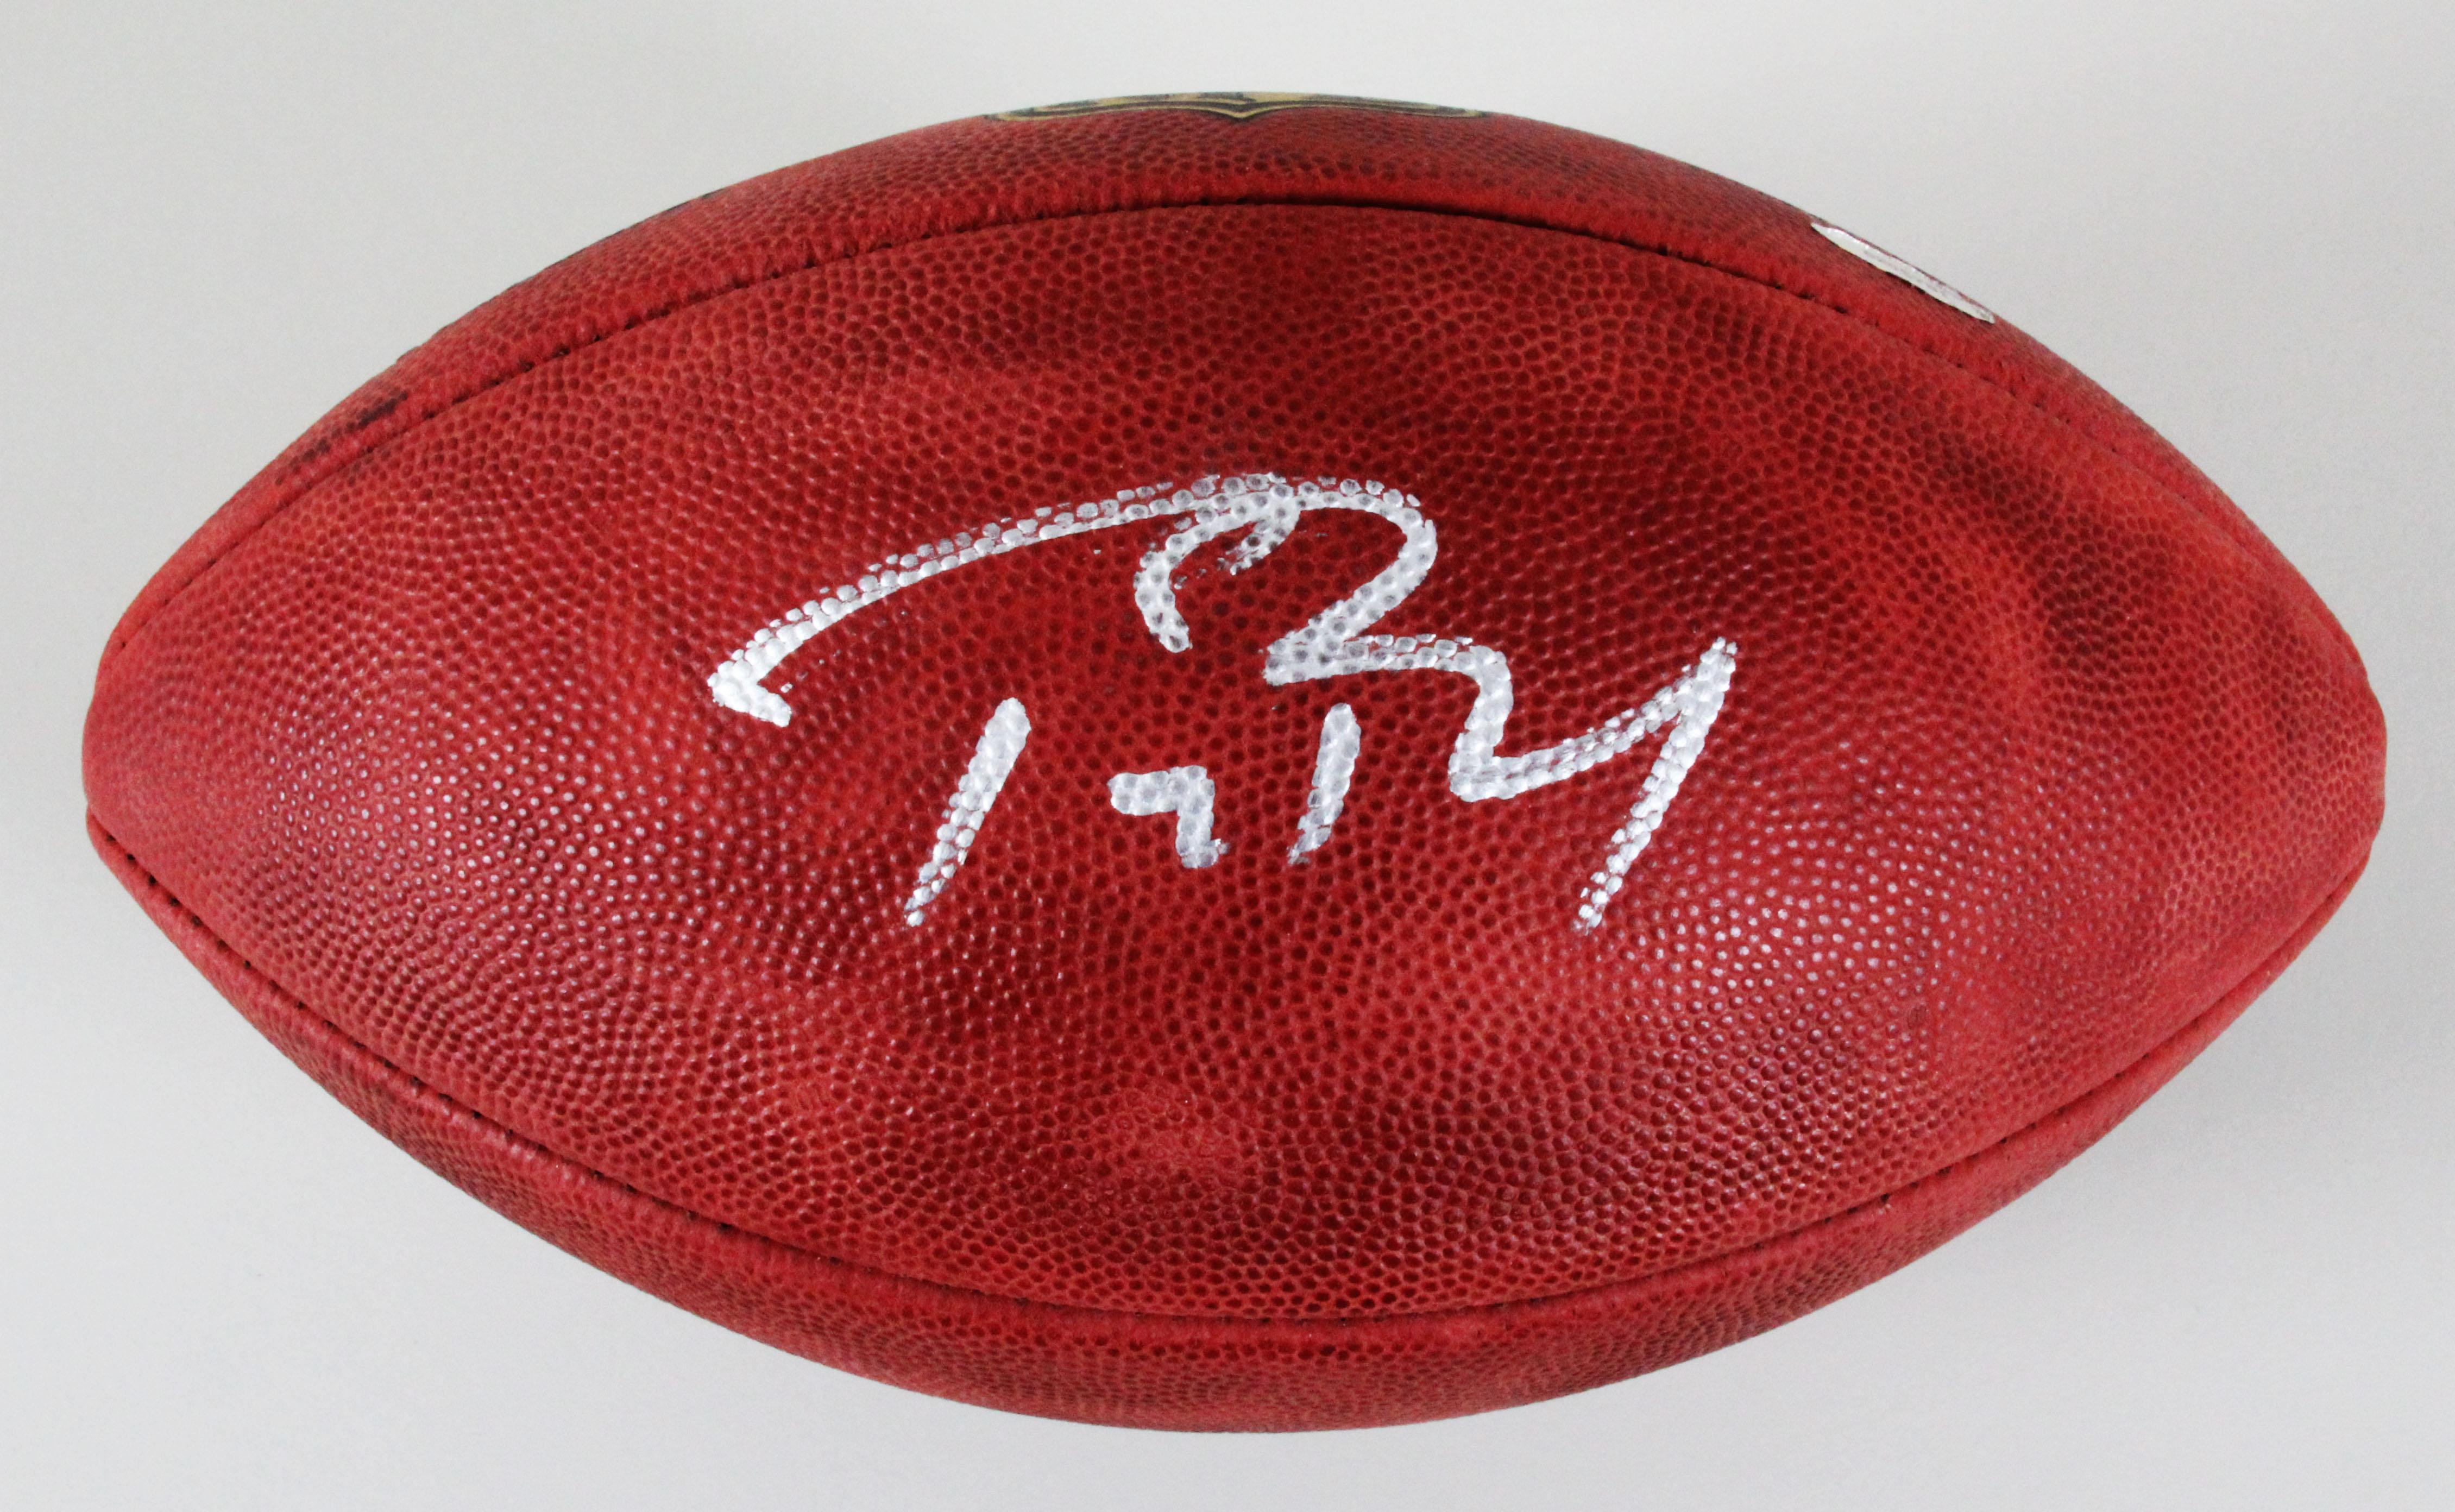 huge selection of 7d7d6 678c5 Tom Brady Signed Football Patriots - COA TriStar